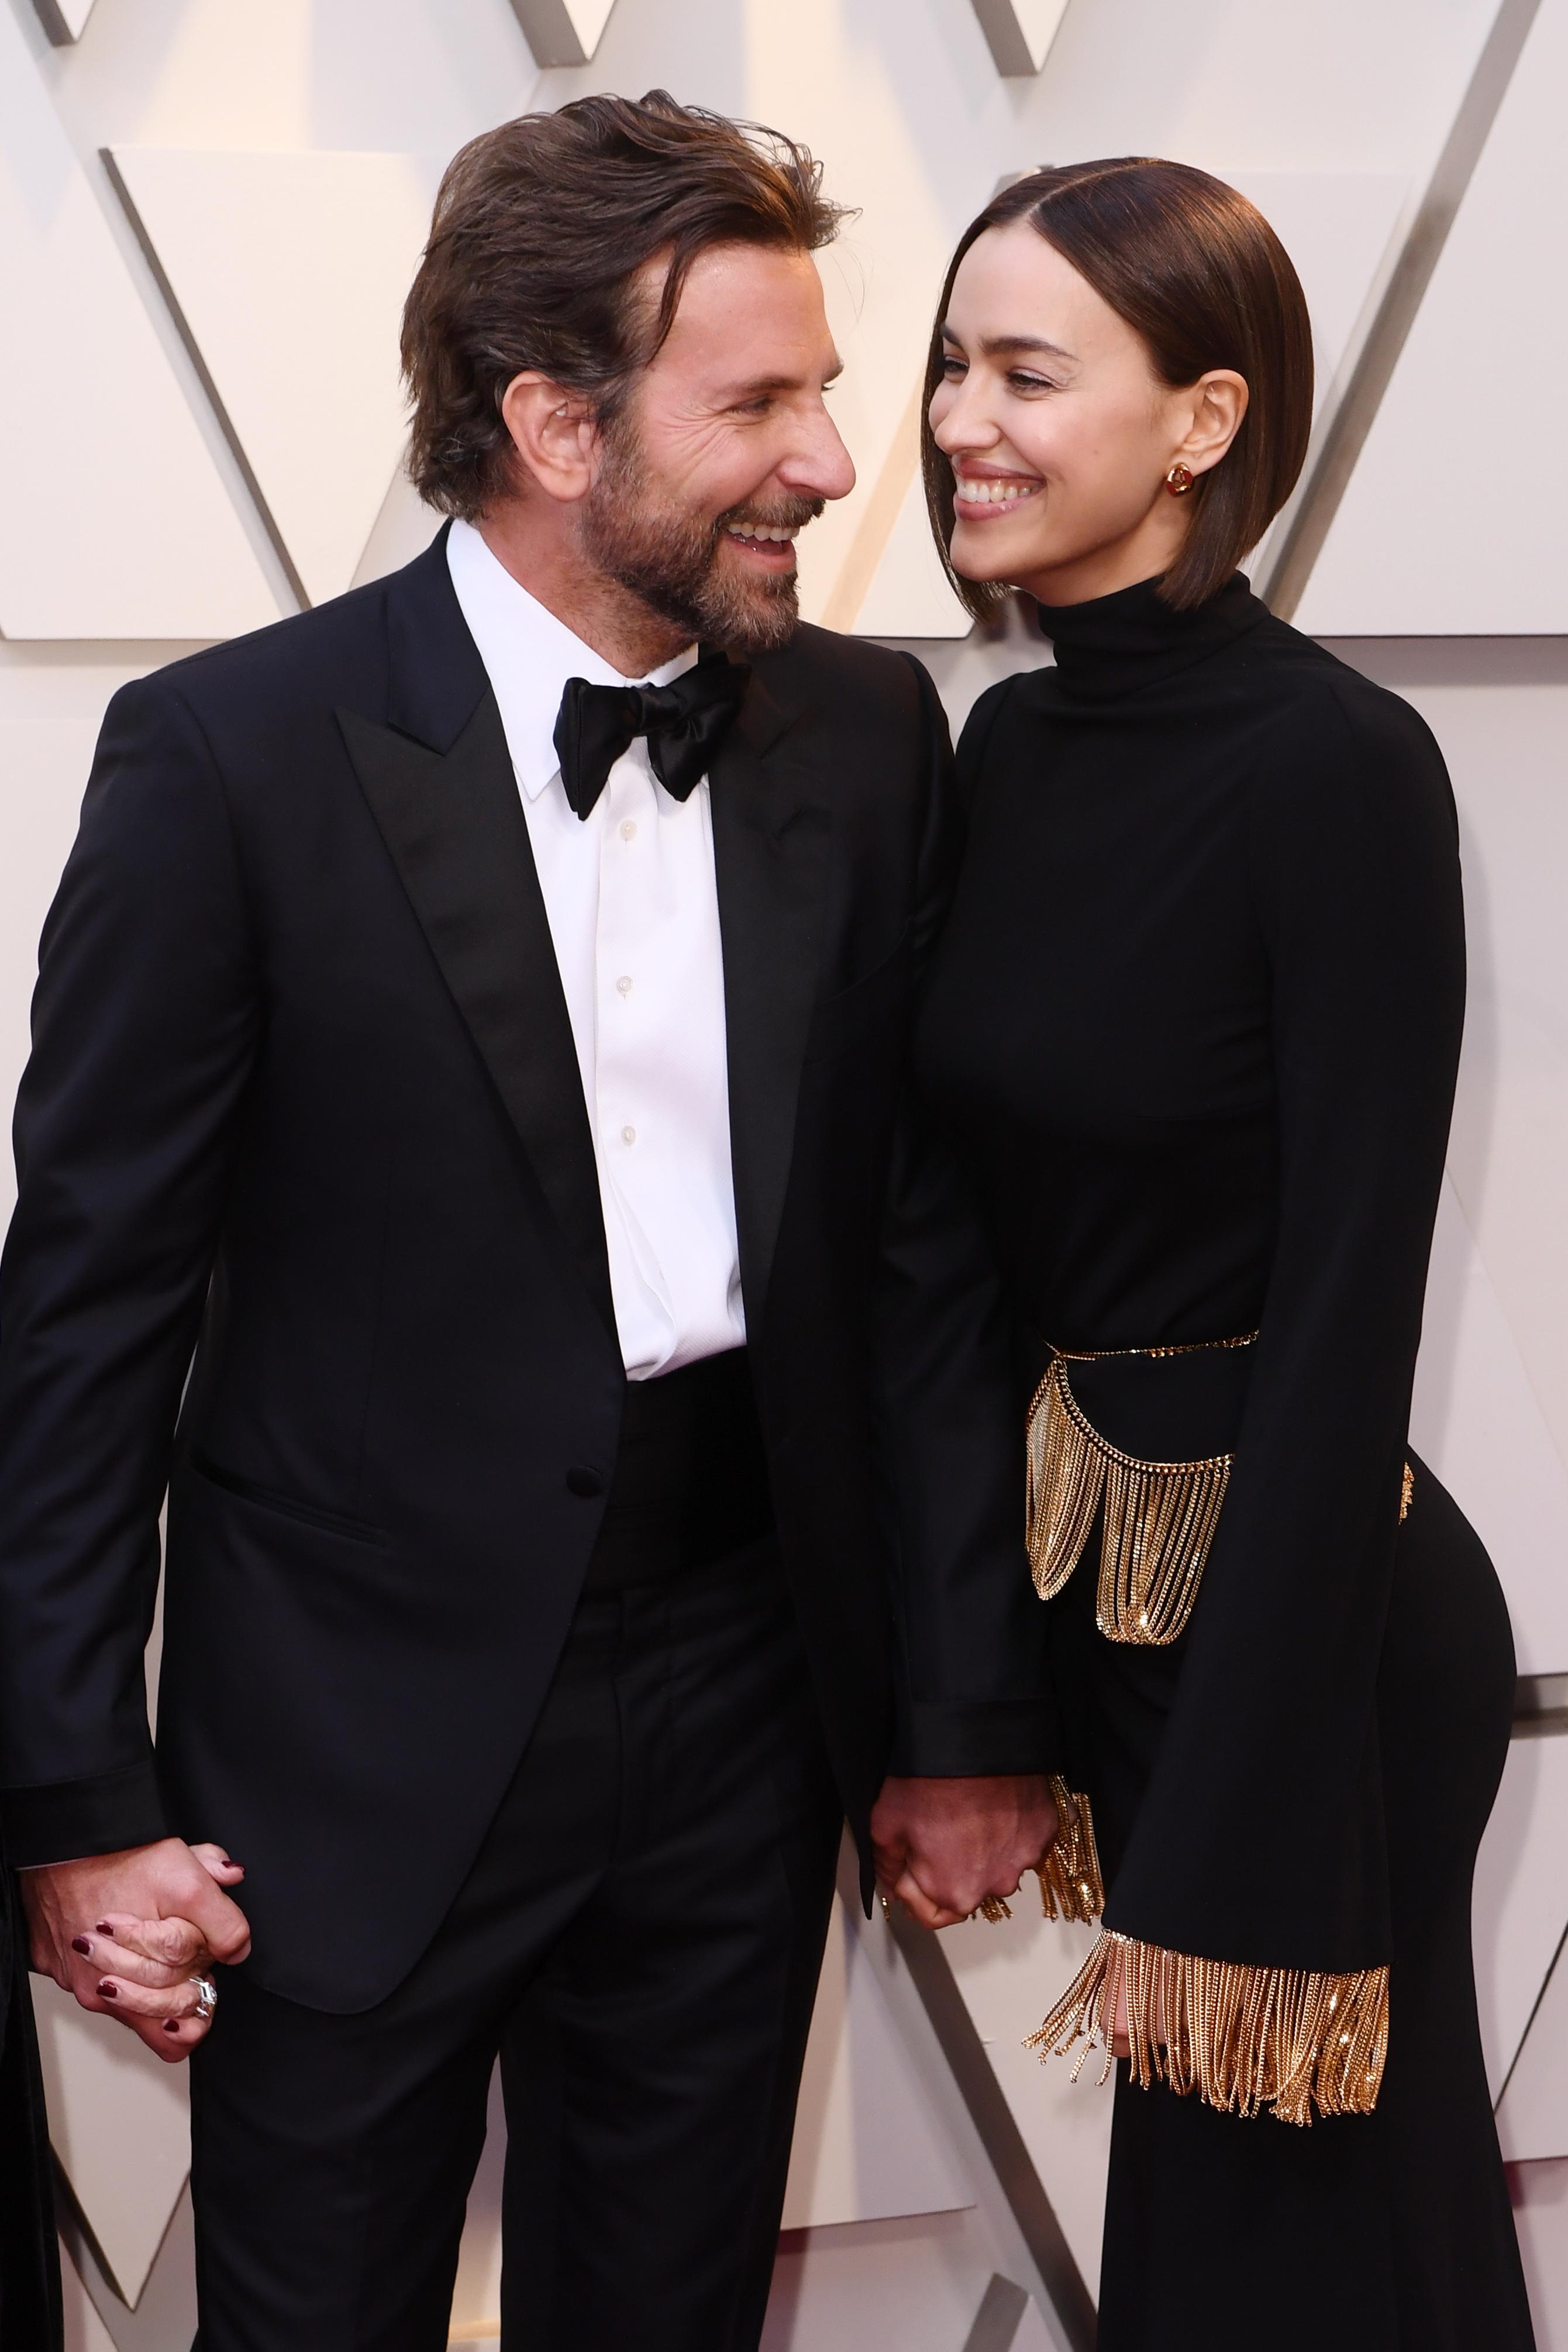 Bradley Cooper | E! Entertainment @EONLINELATINO